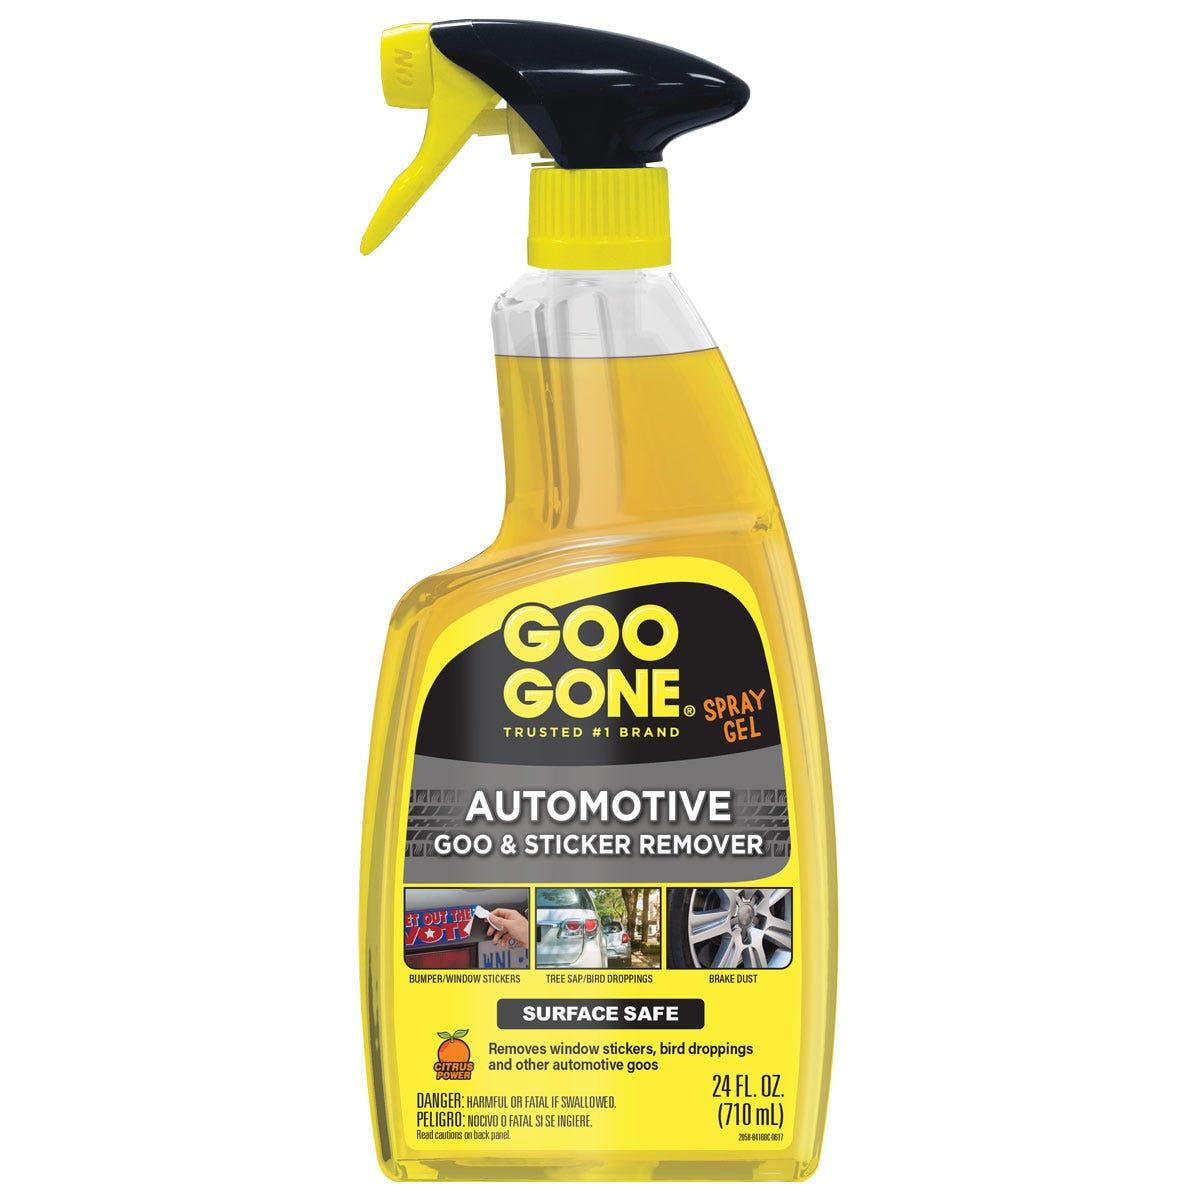 https://googone.com/media/catalog/product/g/o/goo-gone-automotive-spray_front.jpg